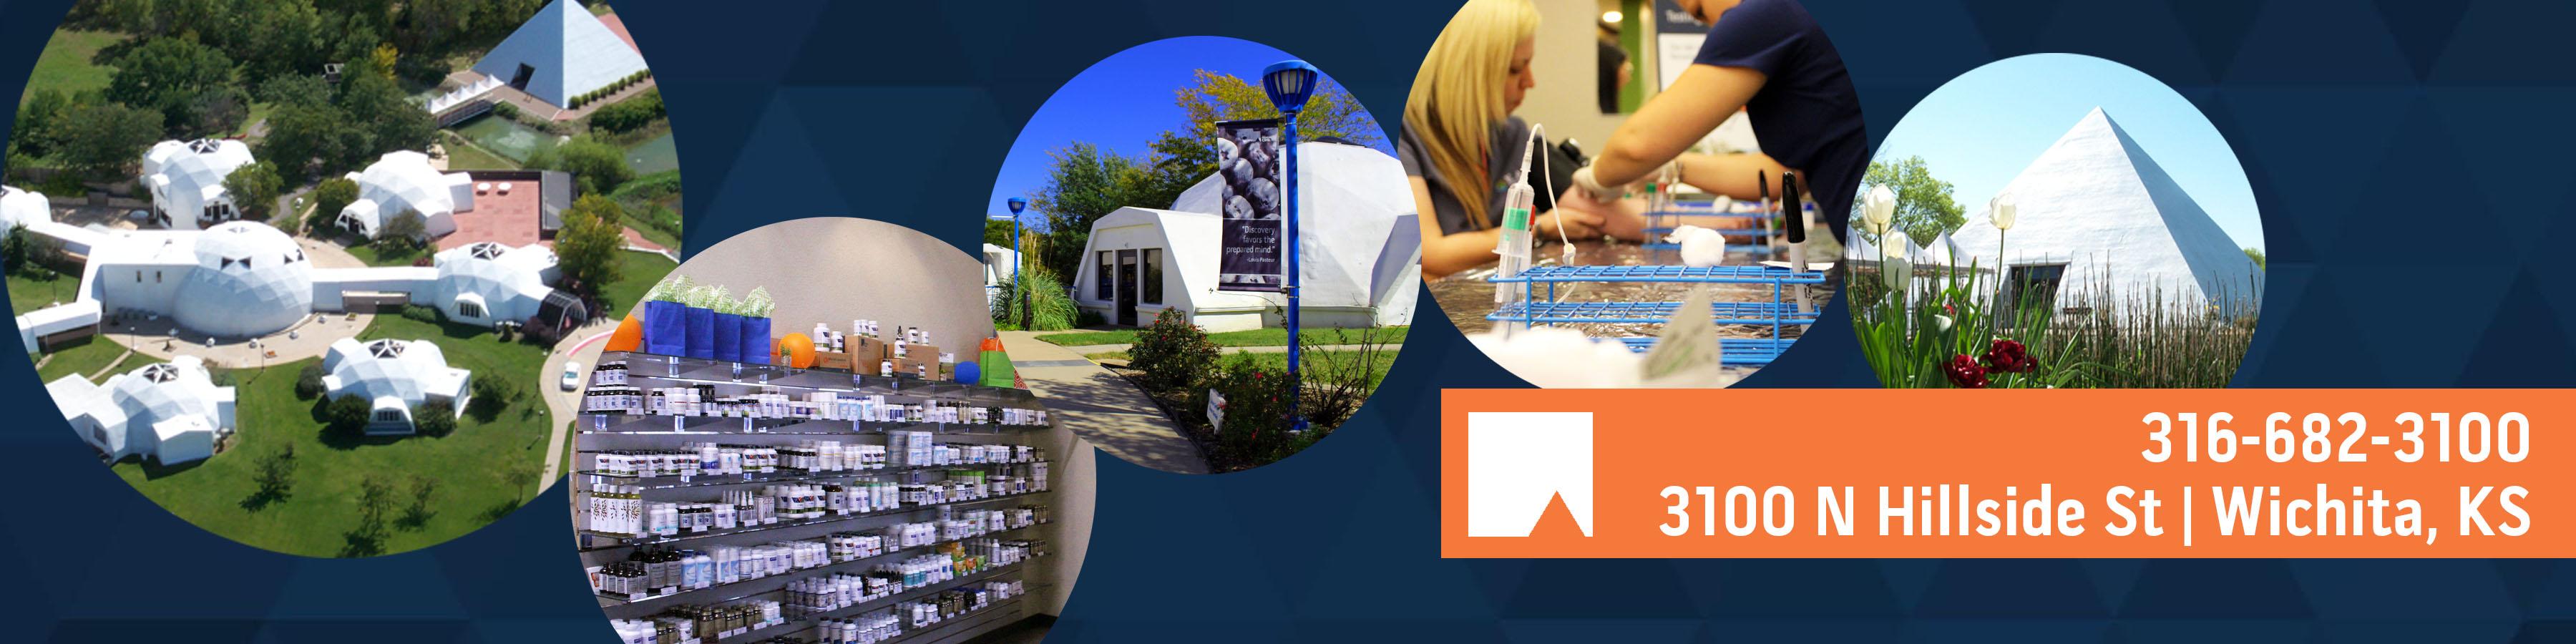 Riordan Clinic Wichita Campus | Holistic Health Practitioners